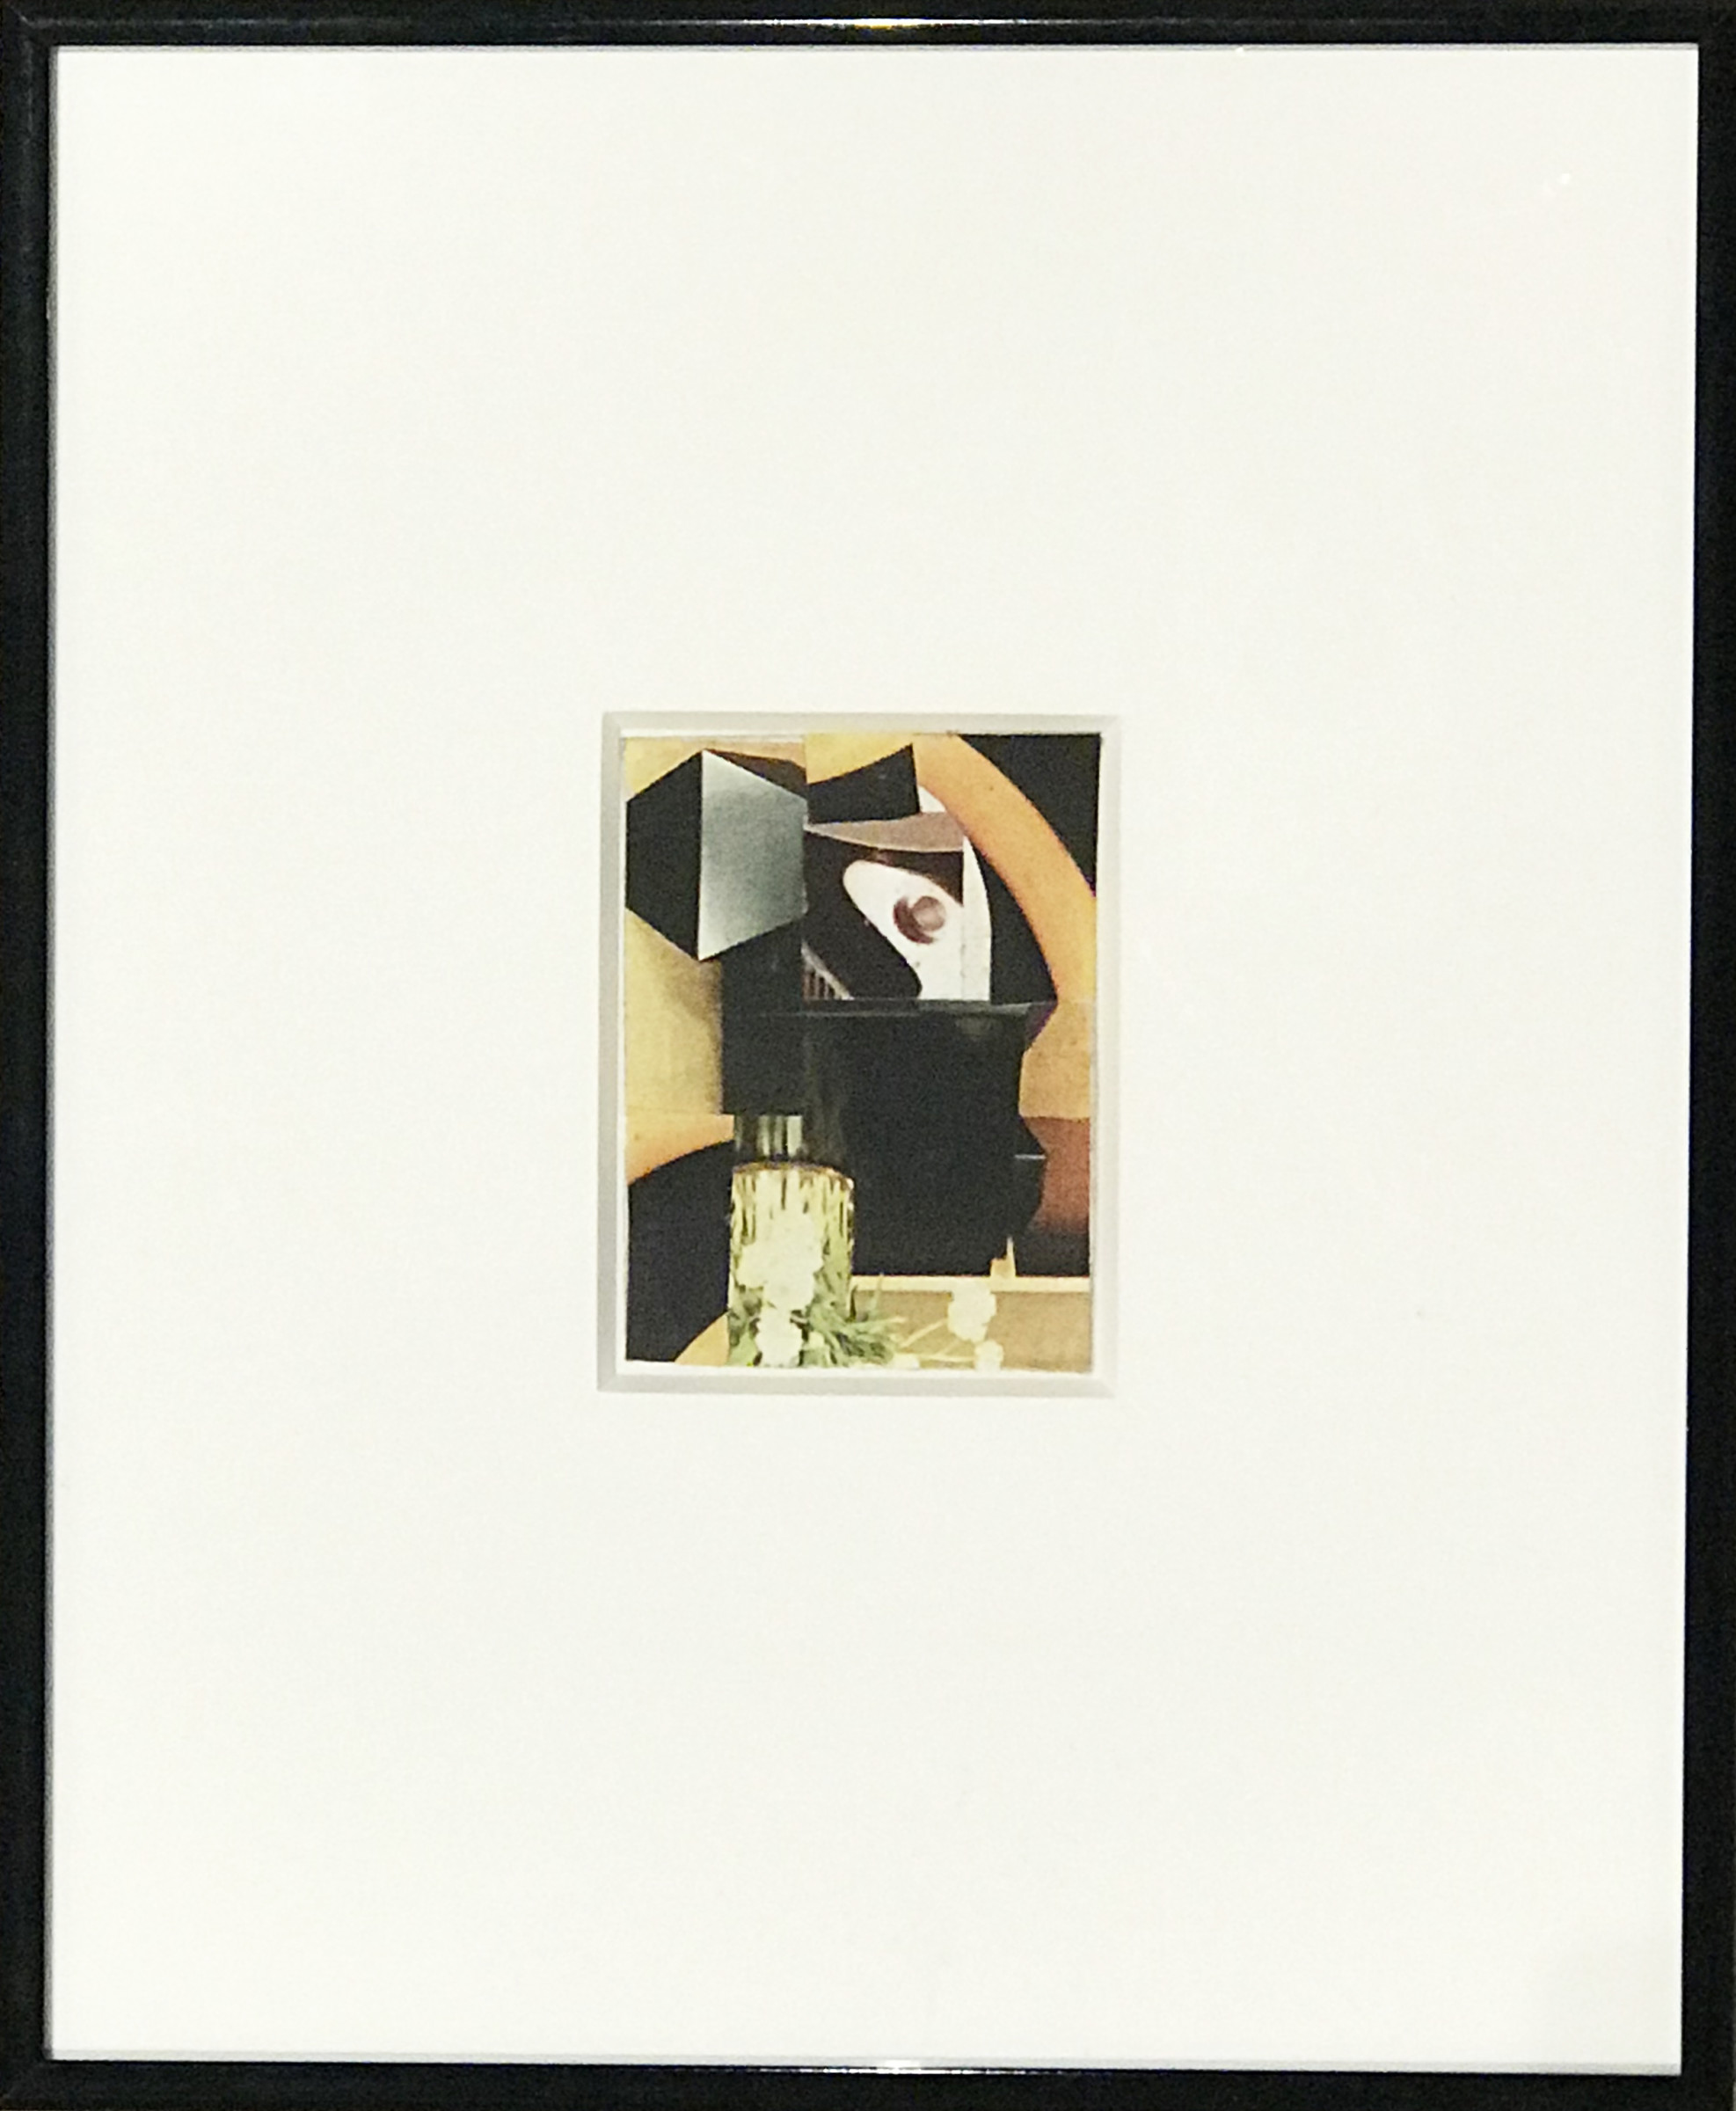 <span class=&#34;link fancybox-details-link&#34;><a href=&#34;/artworks/310-jesse-lott-untitled/&#34;>View Detail Page</a></span><div class=&#34;artist&#34;><strong>Jesse Lott</strong></div> <div class=&#34;title&#34;>Untitled</div> <div class=&#34;medium&#34;>Mixed Media</div> <div class=&#34;dimensions&#34;>3 1/2 x 2 1/2 in<br /> 8.9 x 6.3 cm</div>